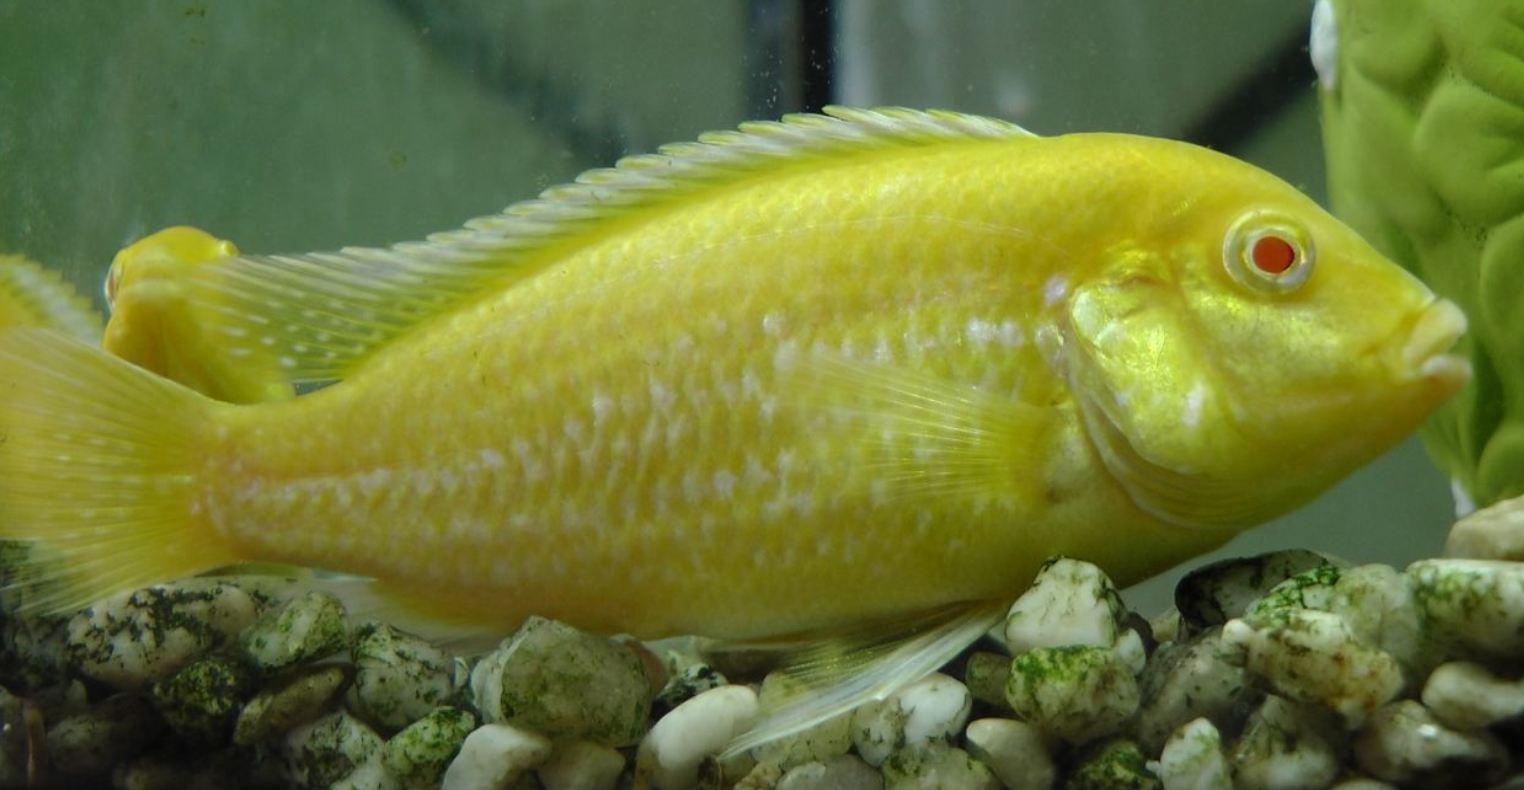 File:Labidochromis Caeruleus Albino 02.JPG - Wikimedia Commons  File:Labidochro...